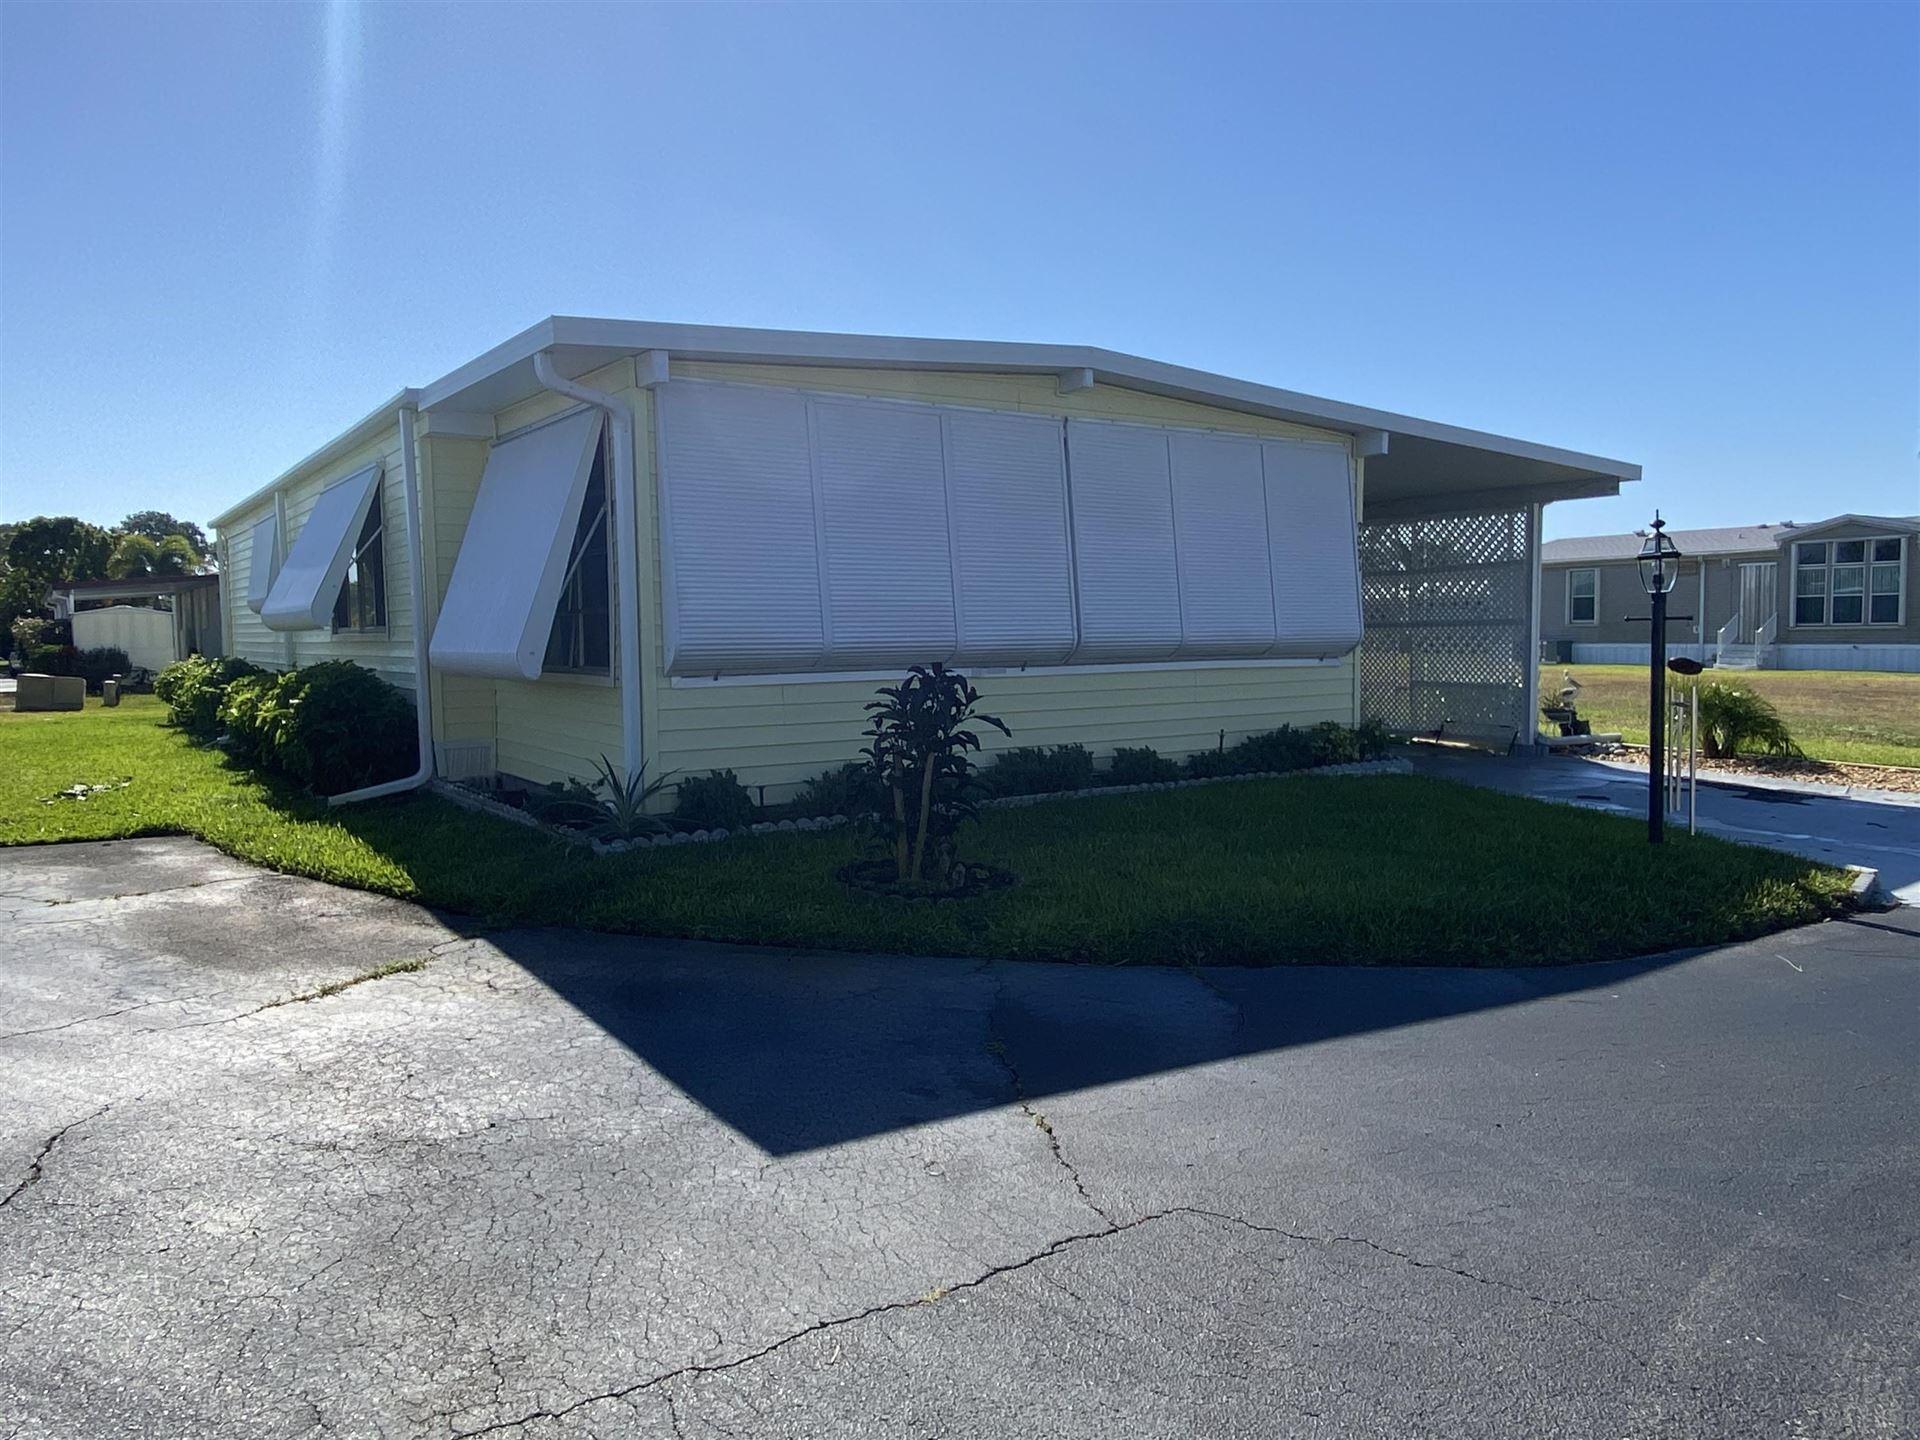 9005 Fomento Bay, Boynton Beach, FL 33436 - MLS#: RX-10707726